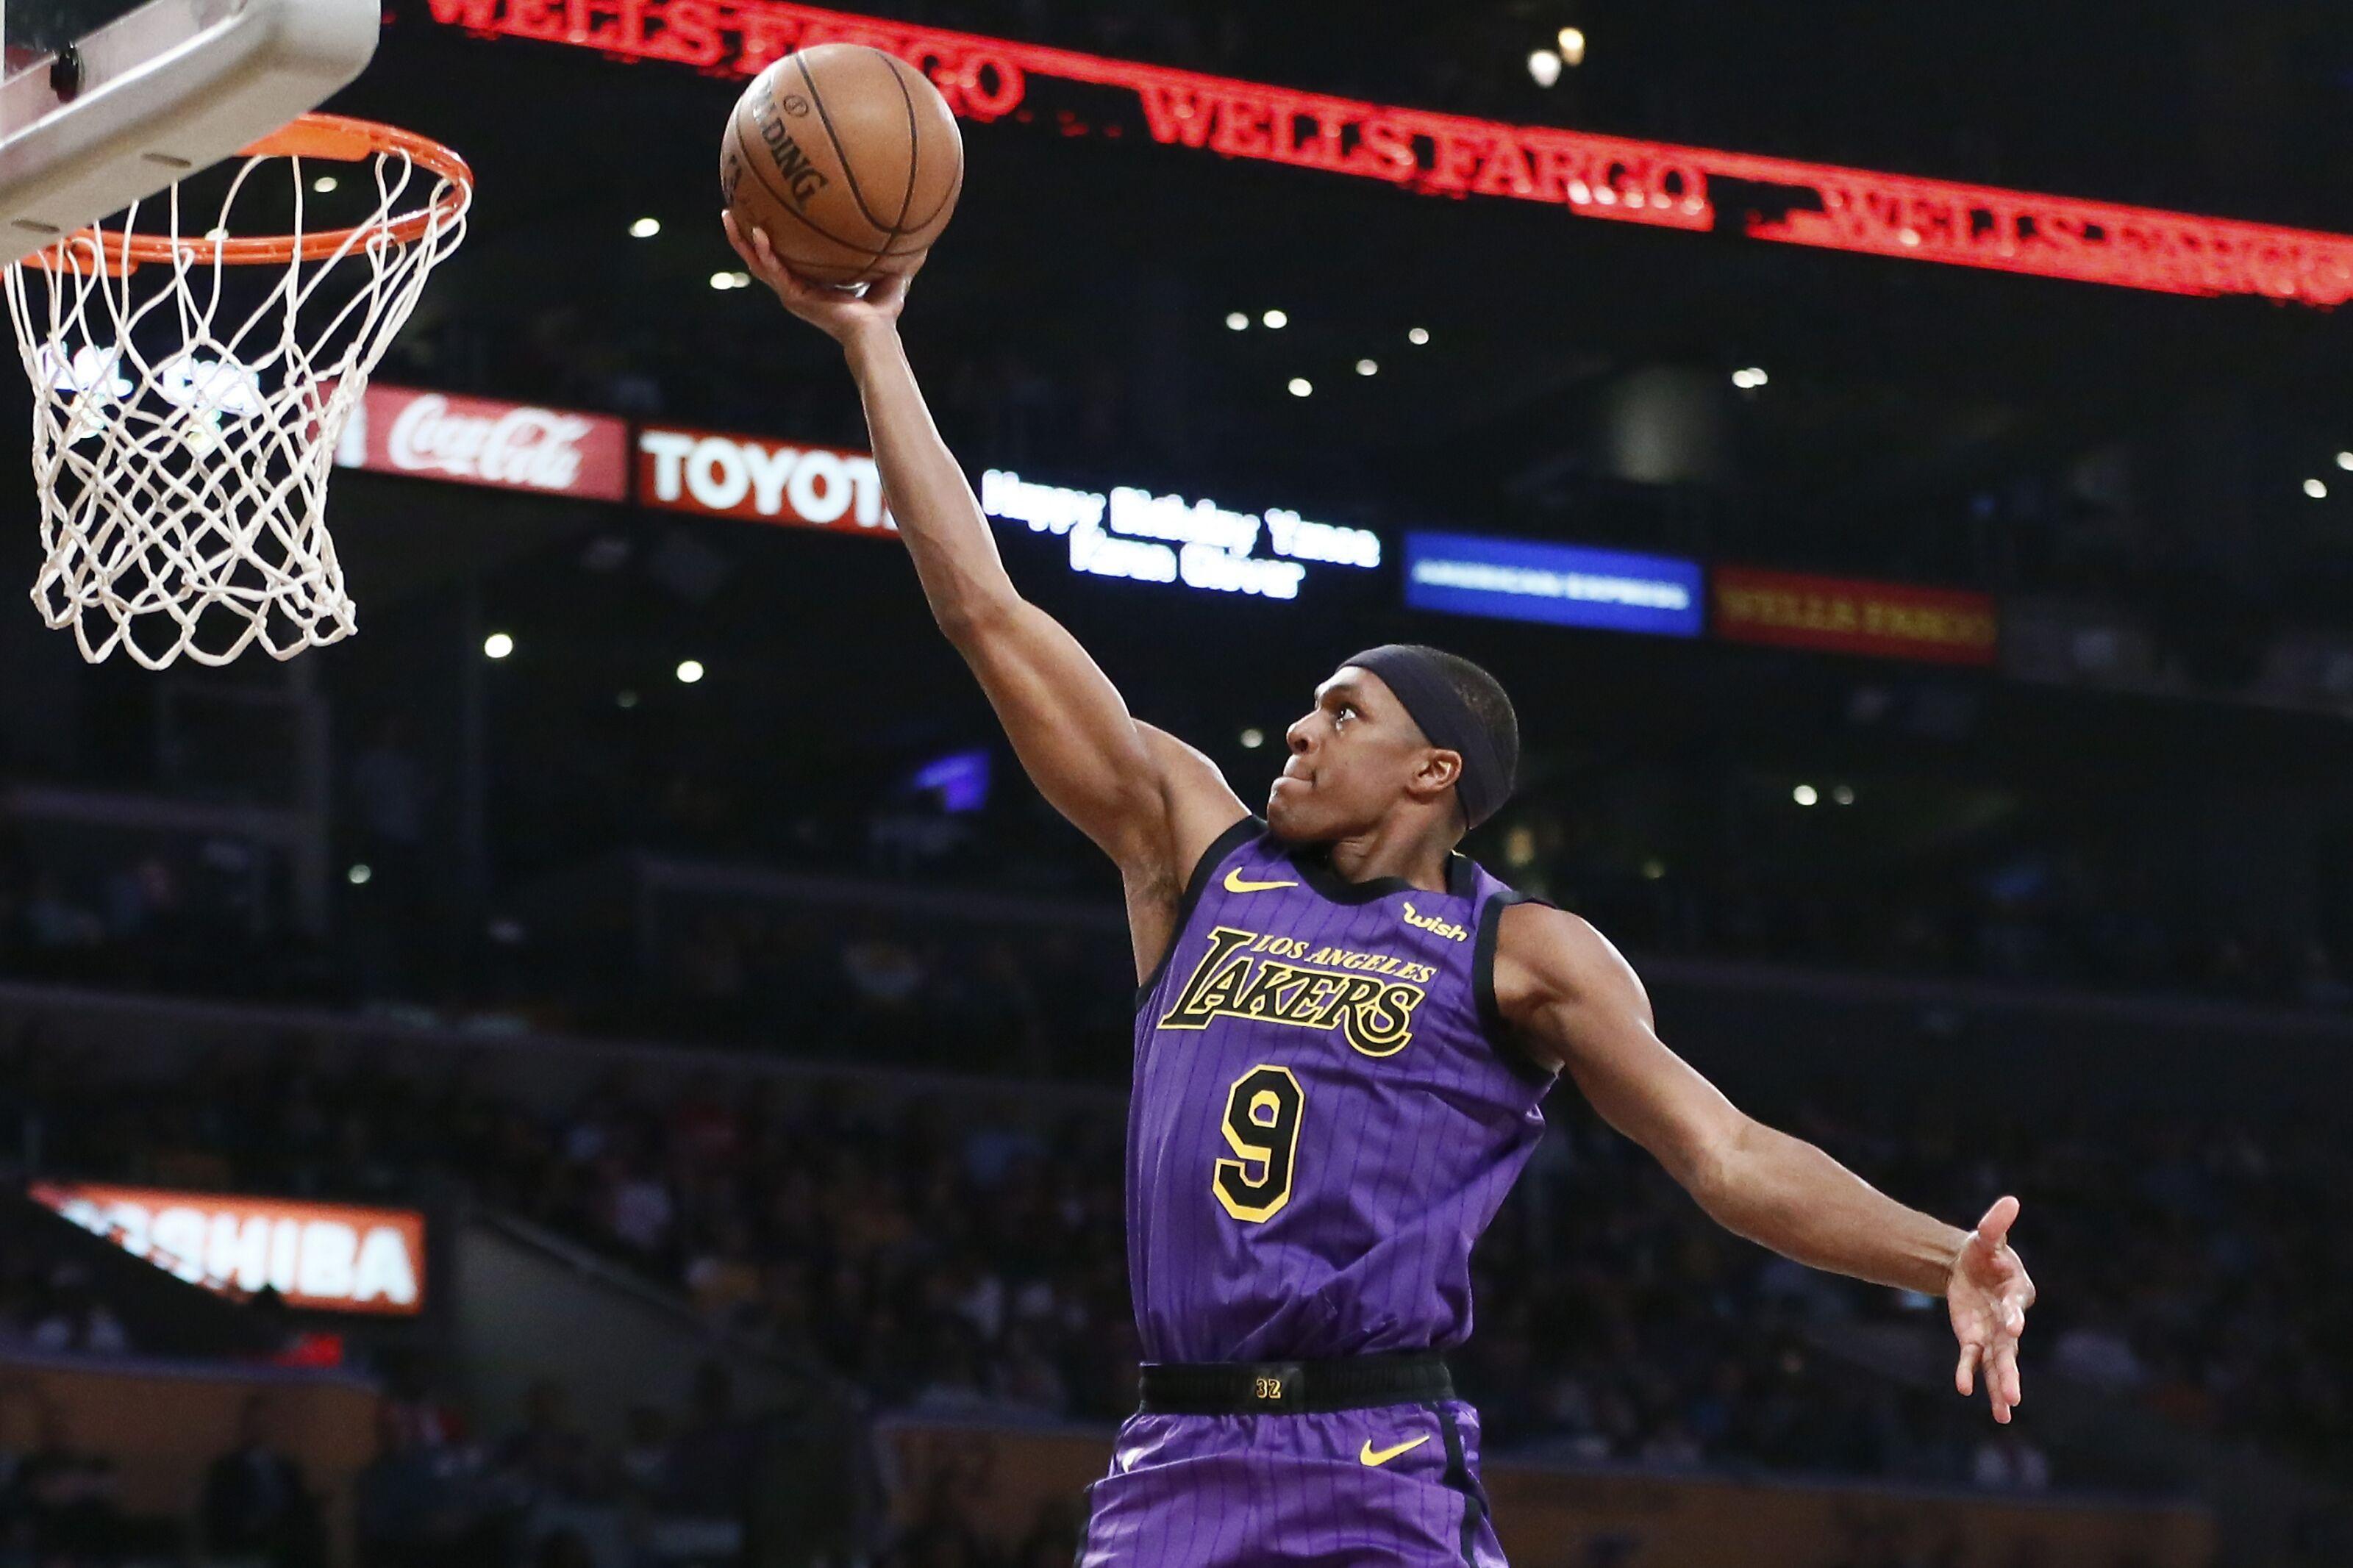 Los Angeles Lakers: 2018-19 player grades for Rajon Rondo